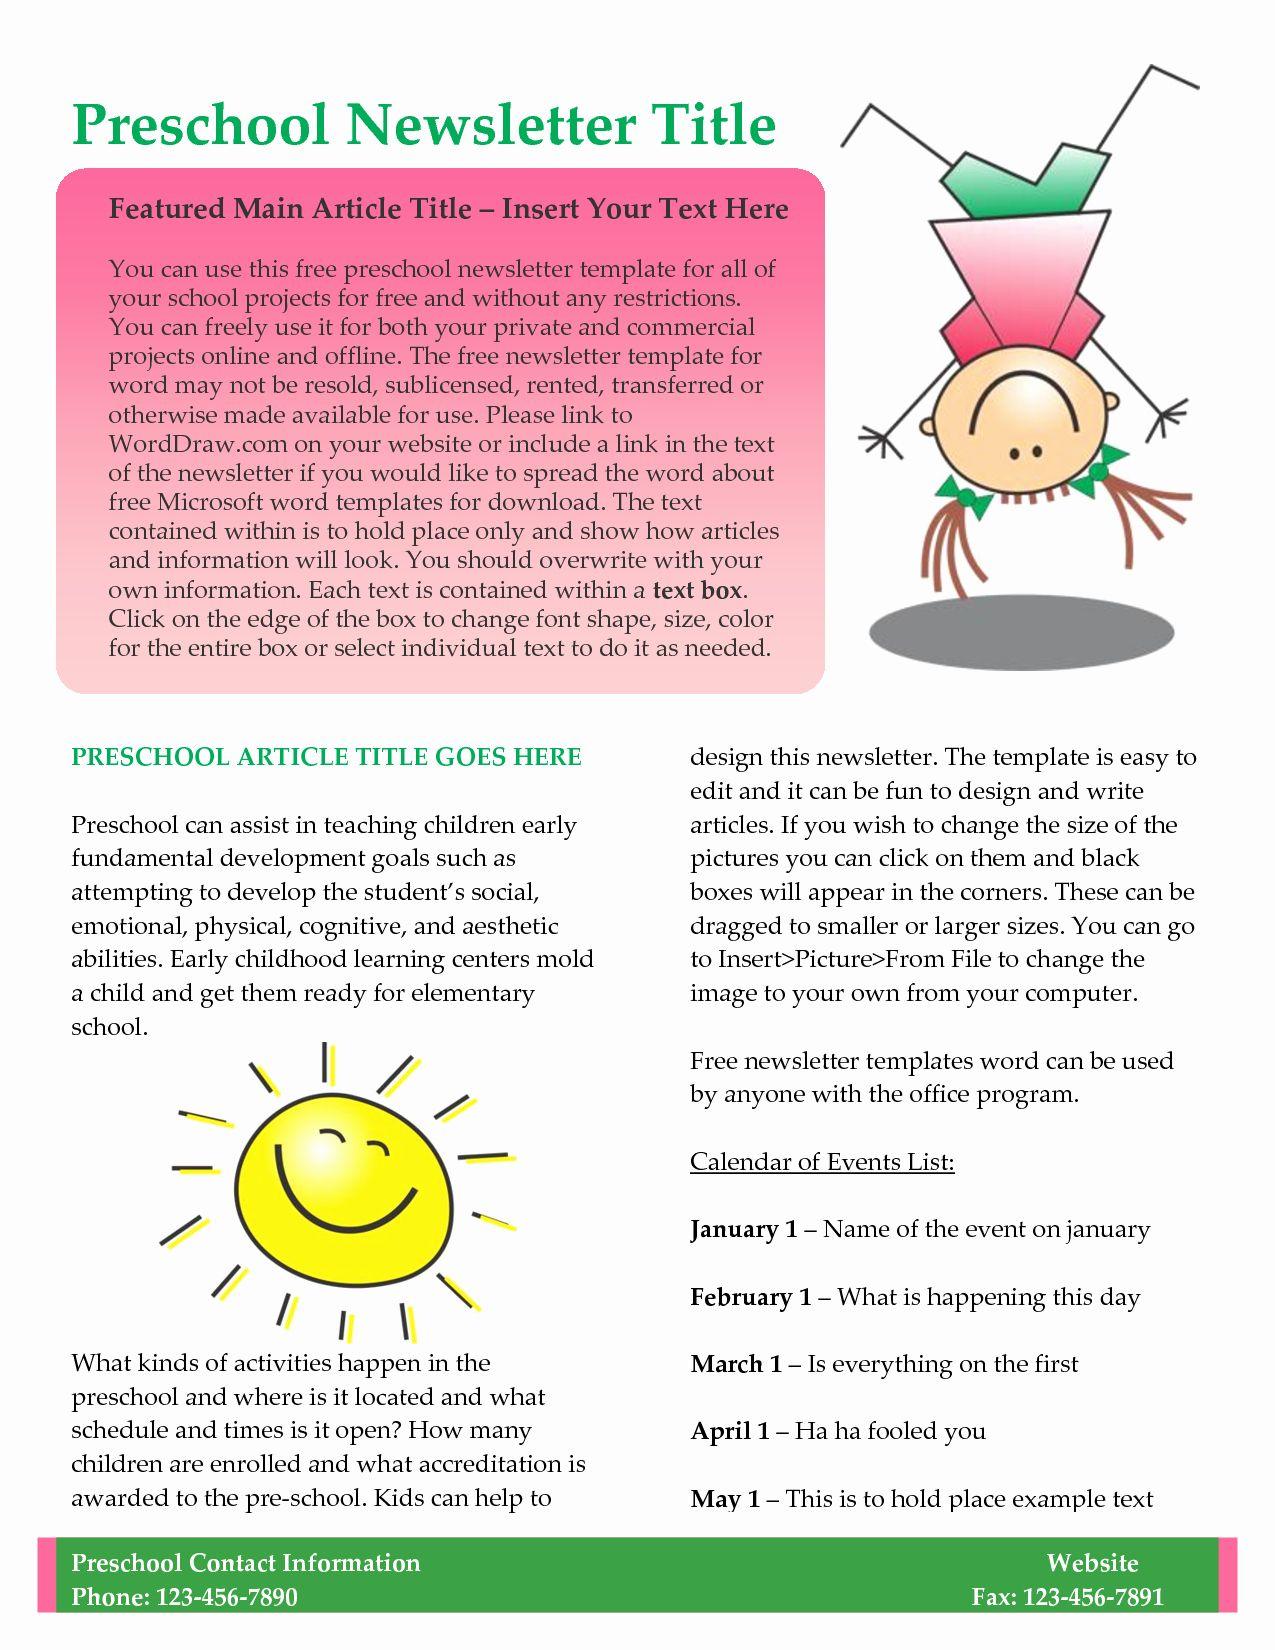 Preschool Newsletter Templates Free New Preschool Newsletter Template Preschool Newsletter Templates Preschool Newsletter School Newsletter Template Free preschool newsletter template microsoft word